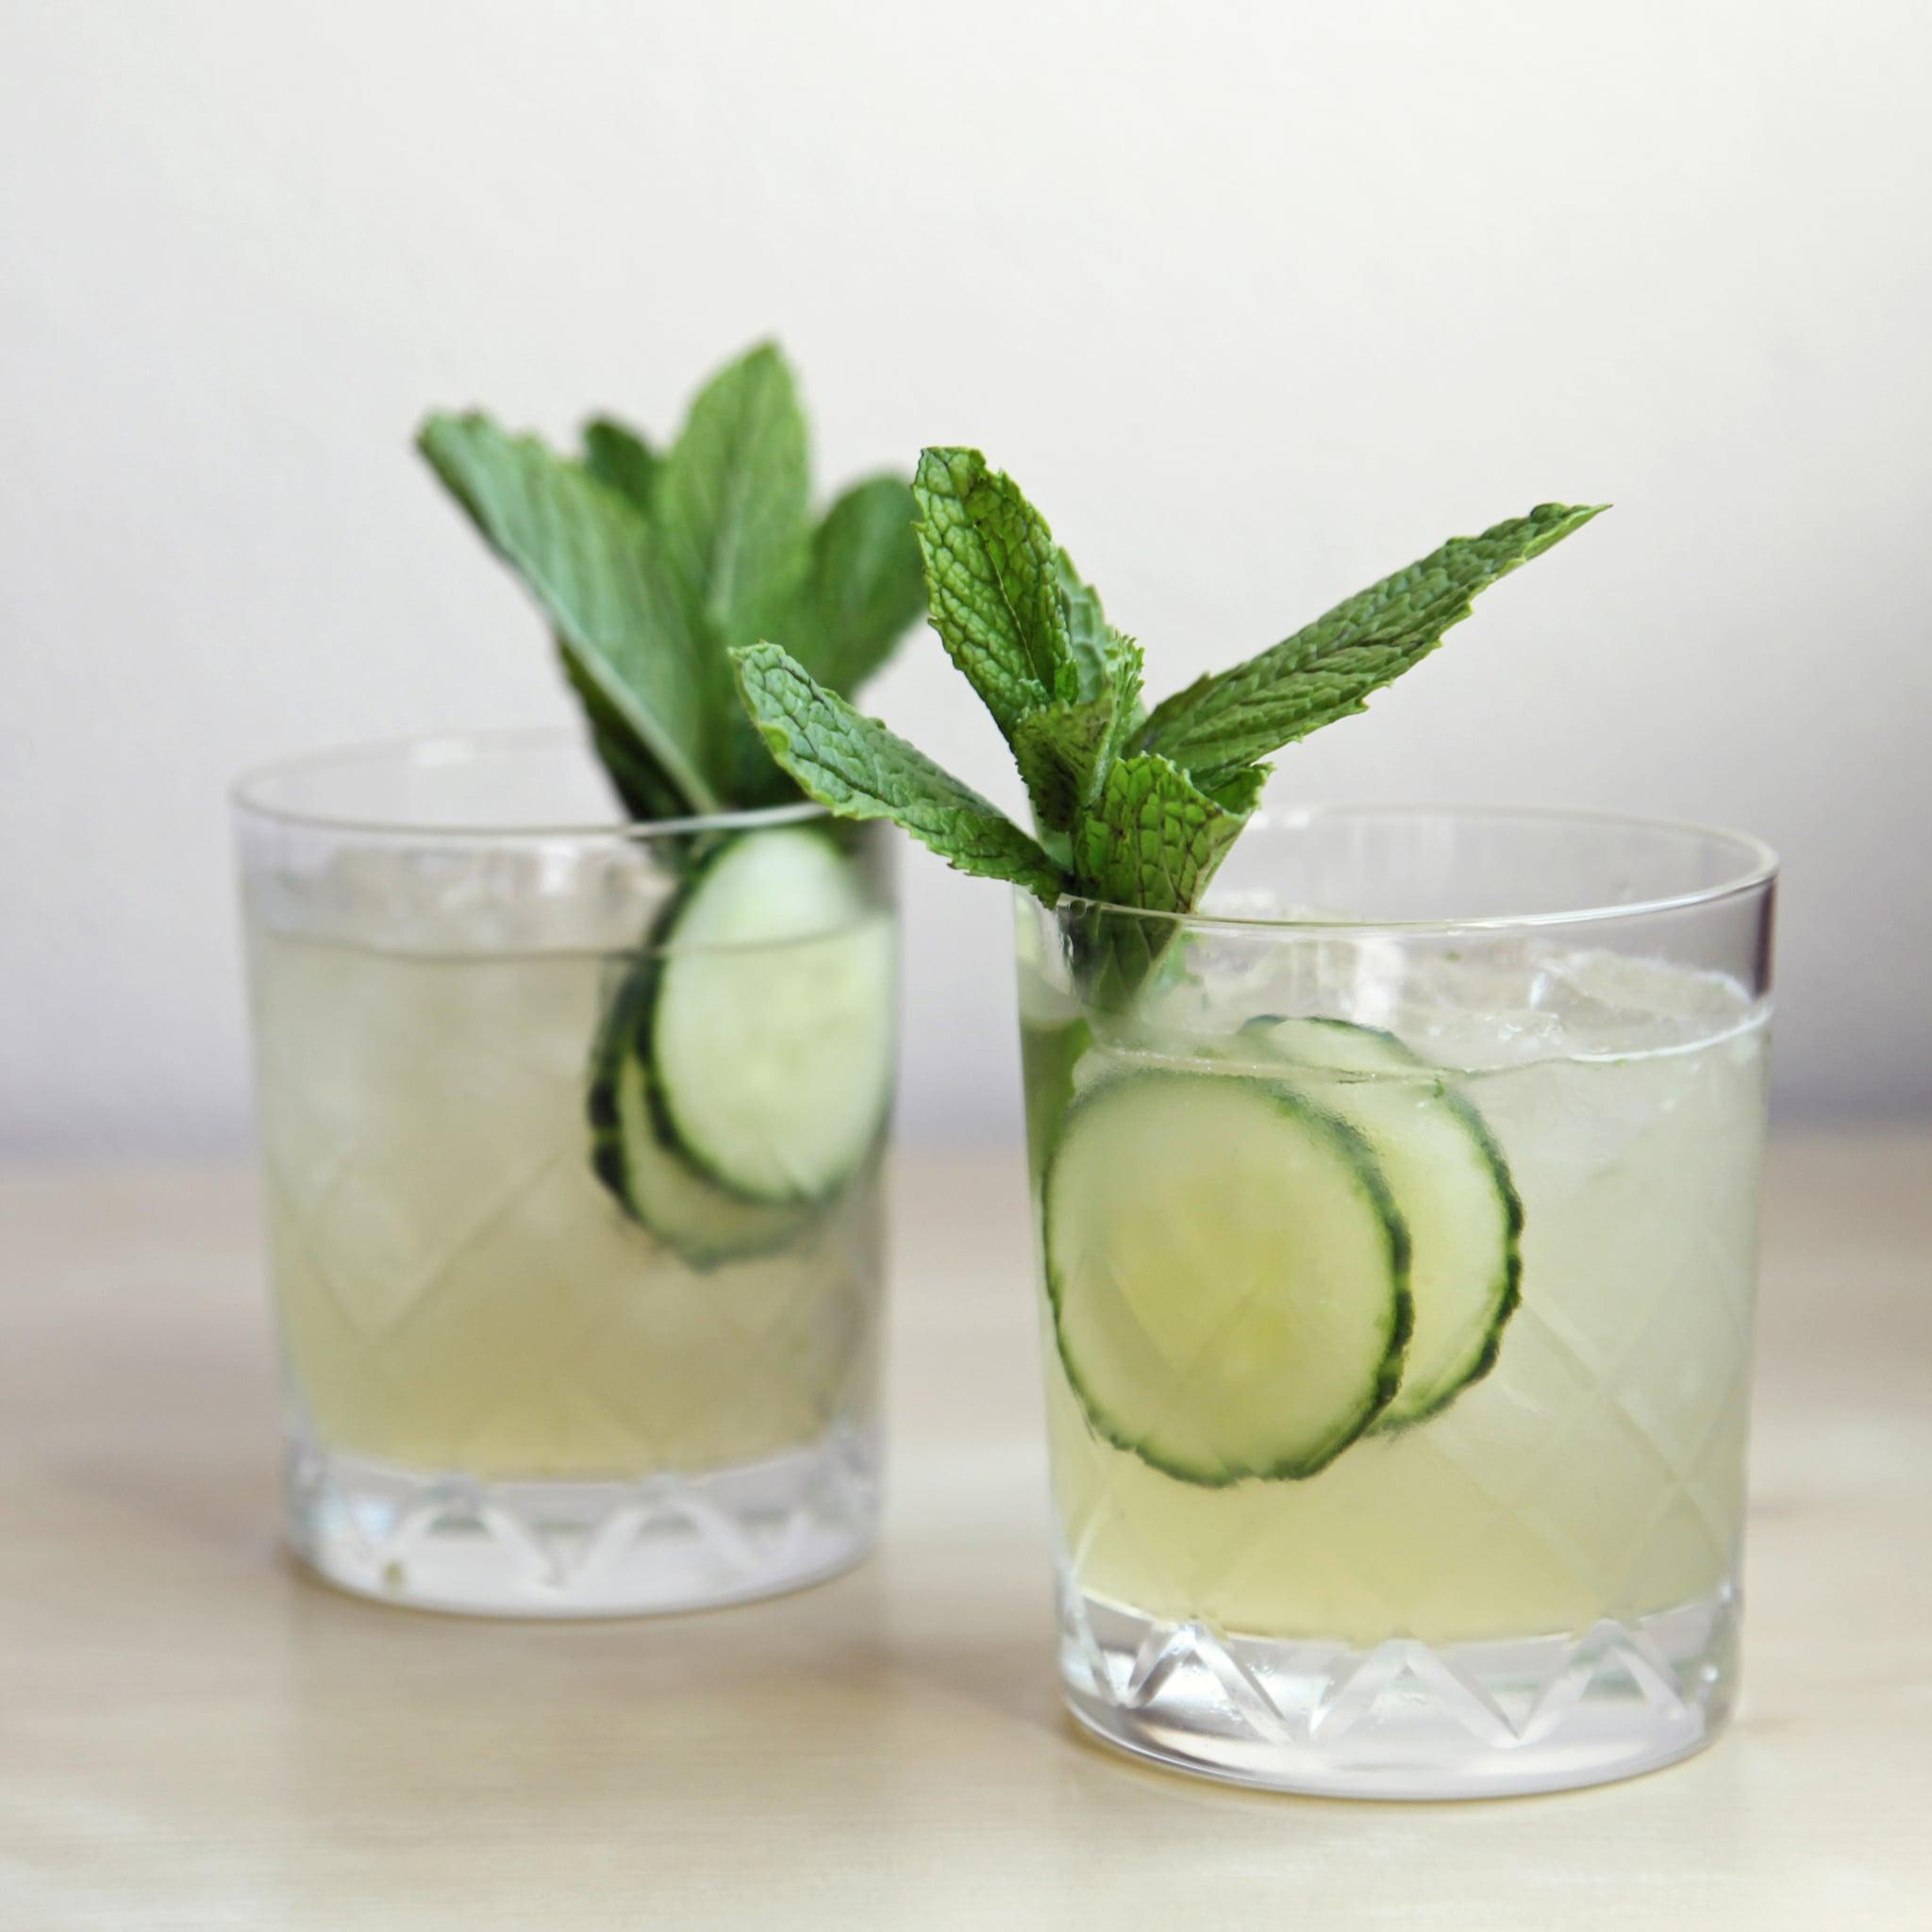 Cucumber-Mint Gin Cocktail | POPSUGAR Food